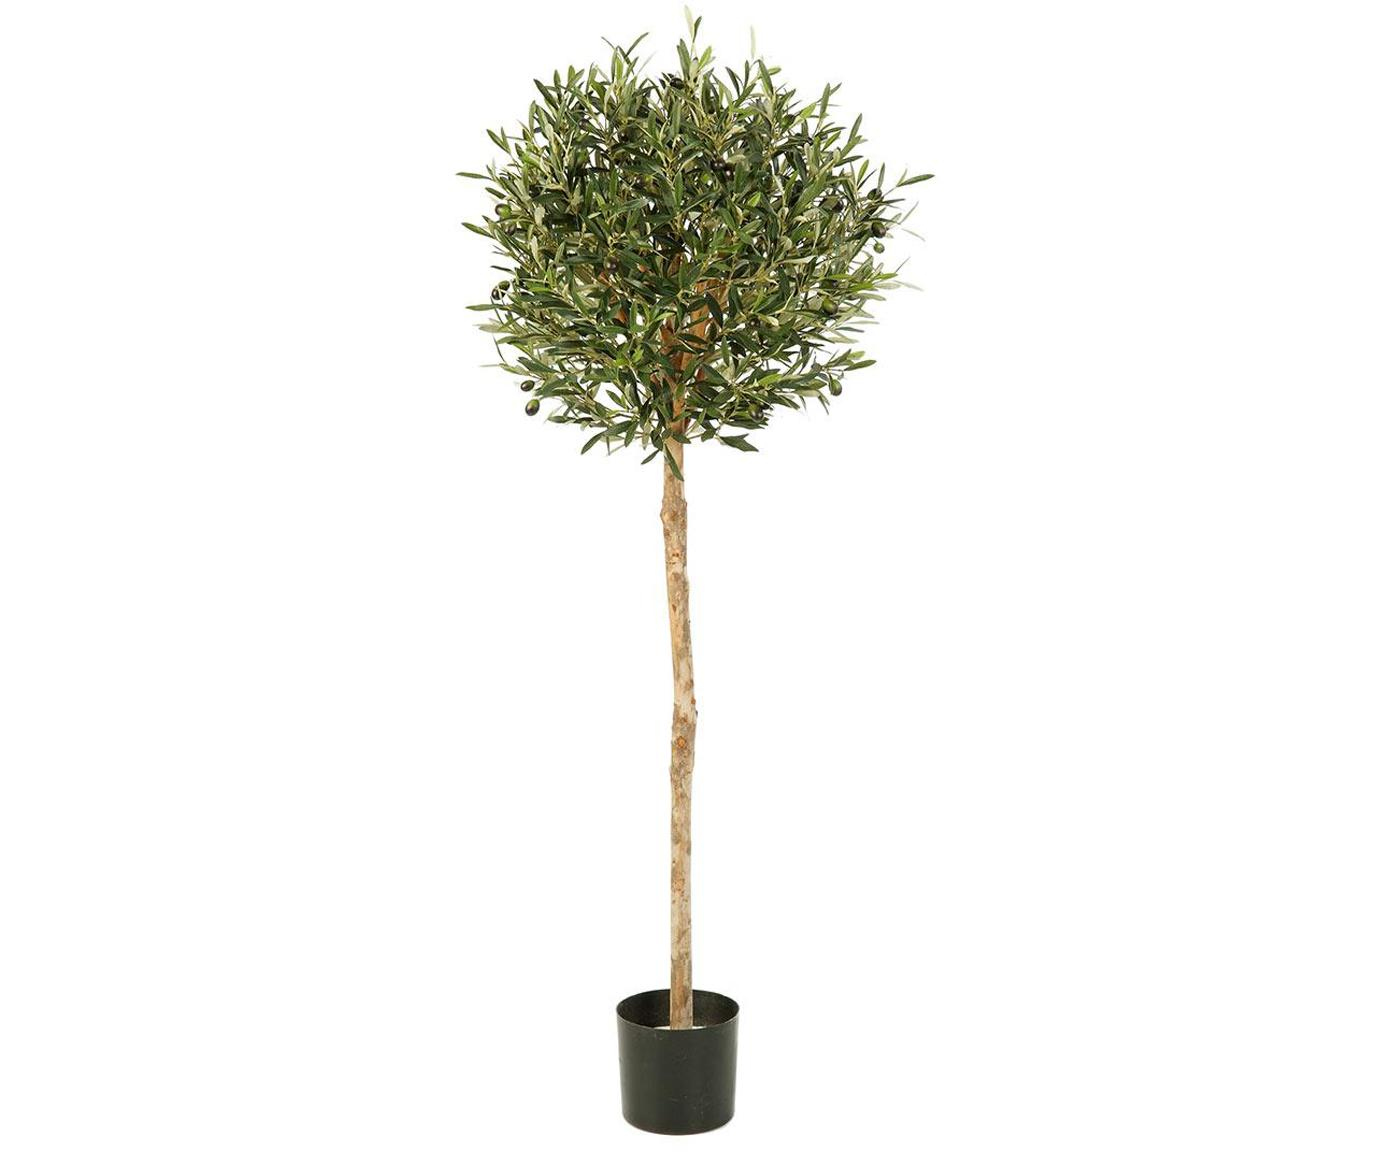 Planta artificial Olivo, Poliéster, tronco de materiales naturales, Verde, Ø 45 x Al 130 cm